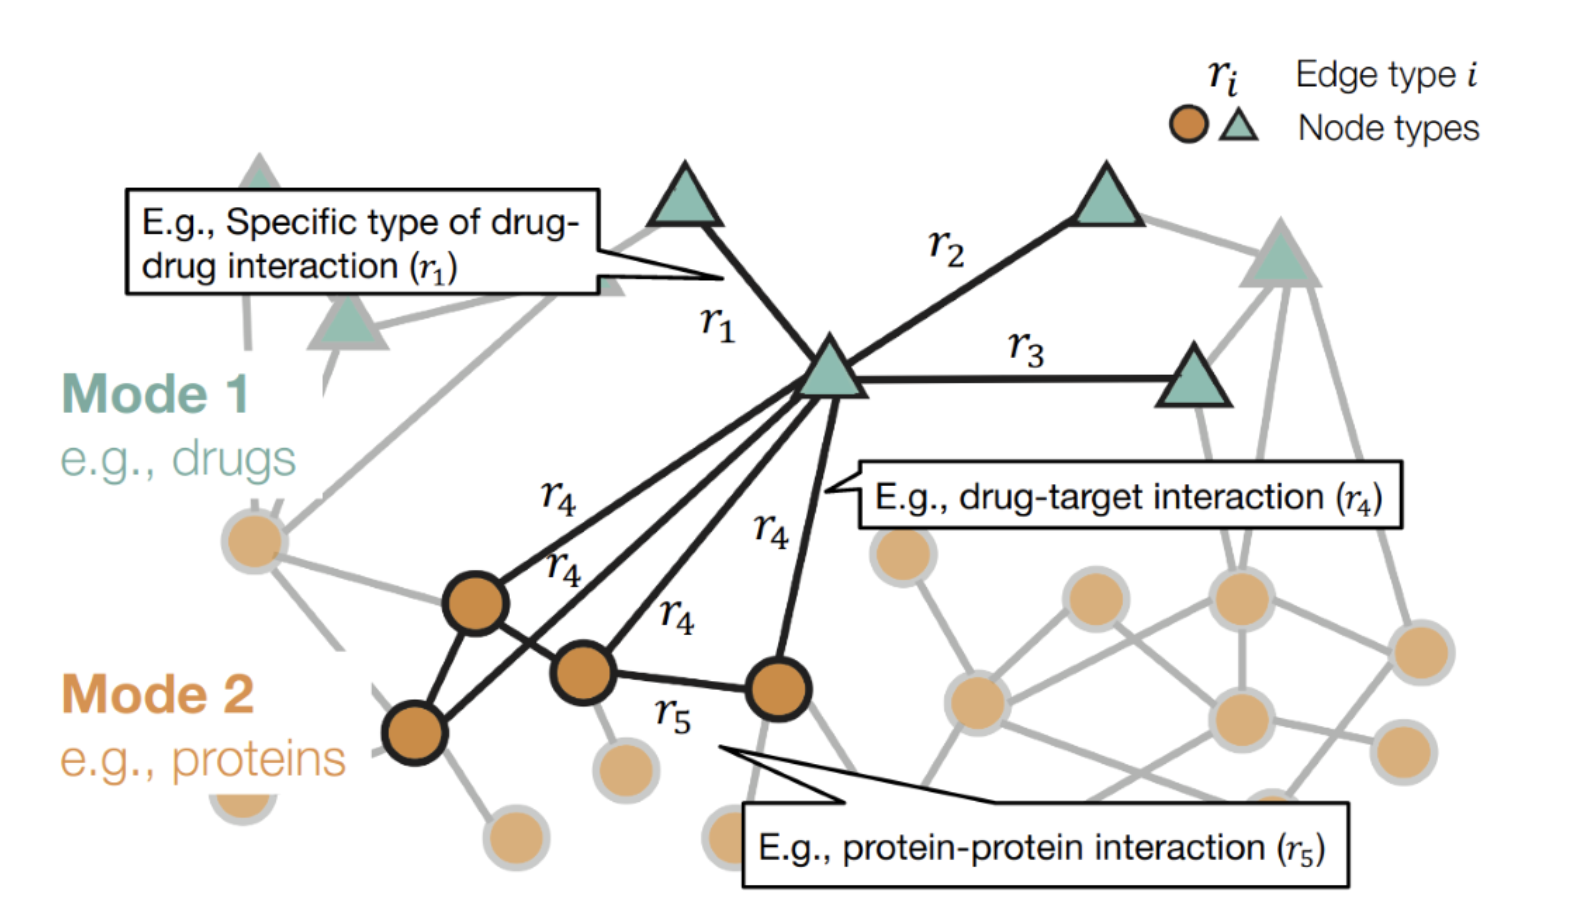 Drug Interactions - Graph Neural Networks for Drug Development by Marinka Zitnik